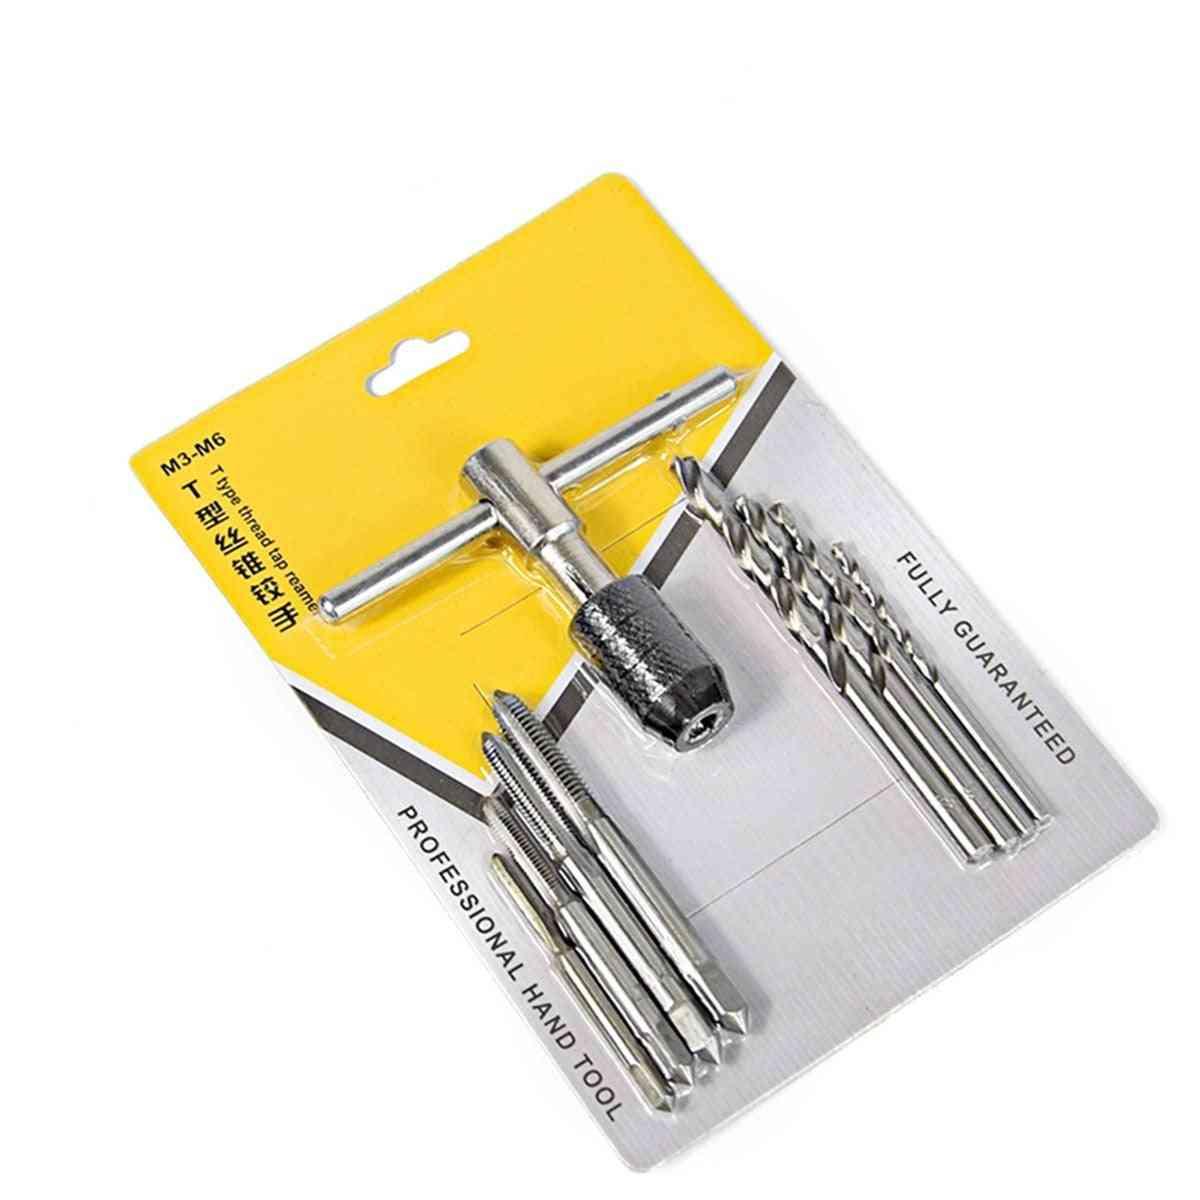 Screw Hole Drill Bit Machine & Thread Tap Hand Tool